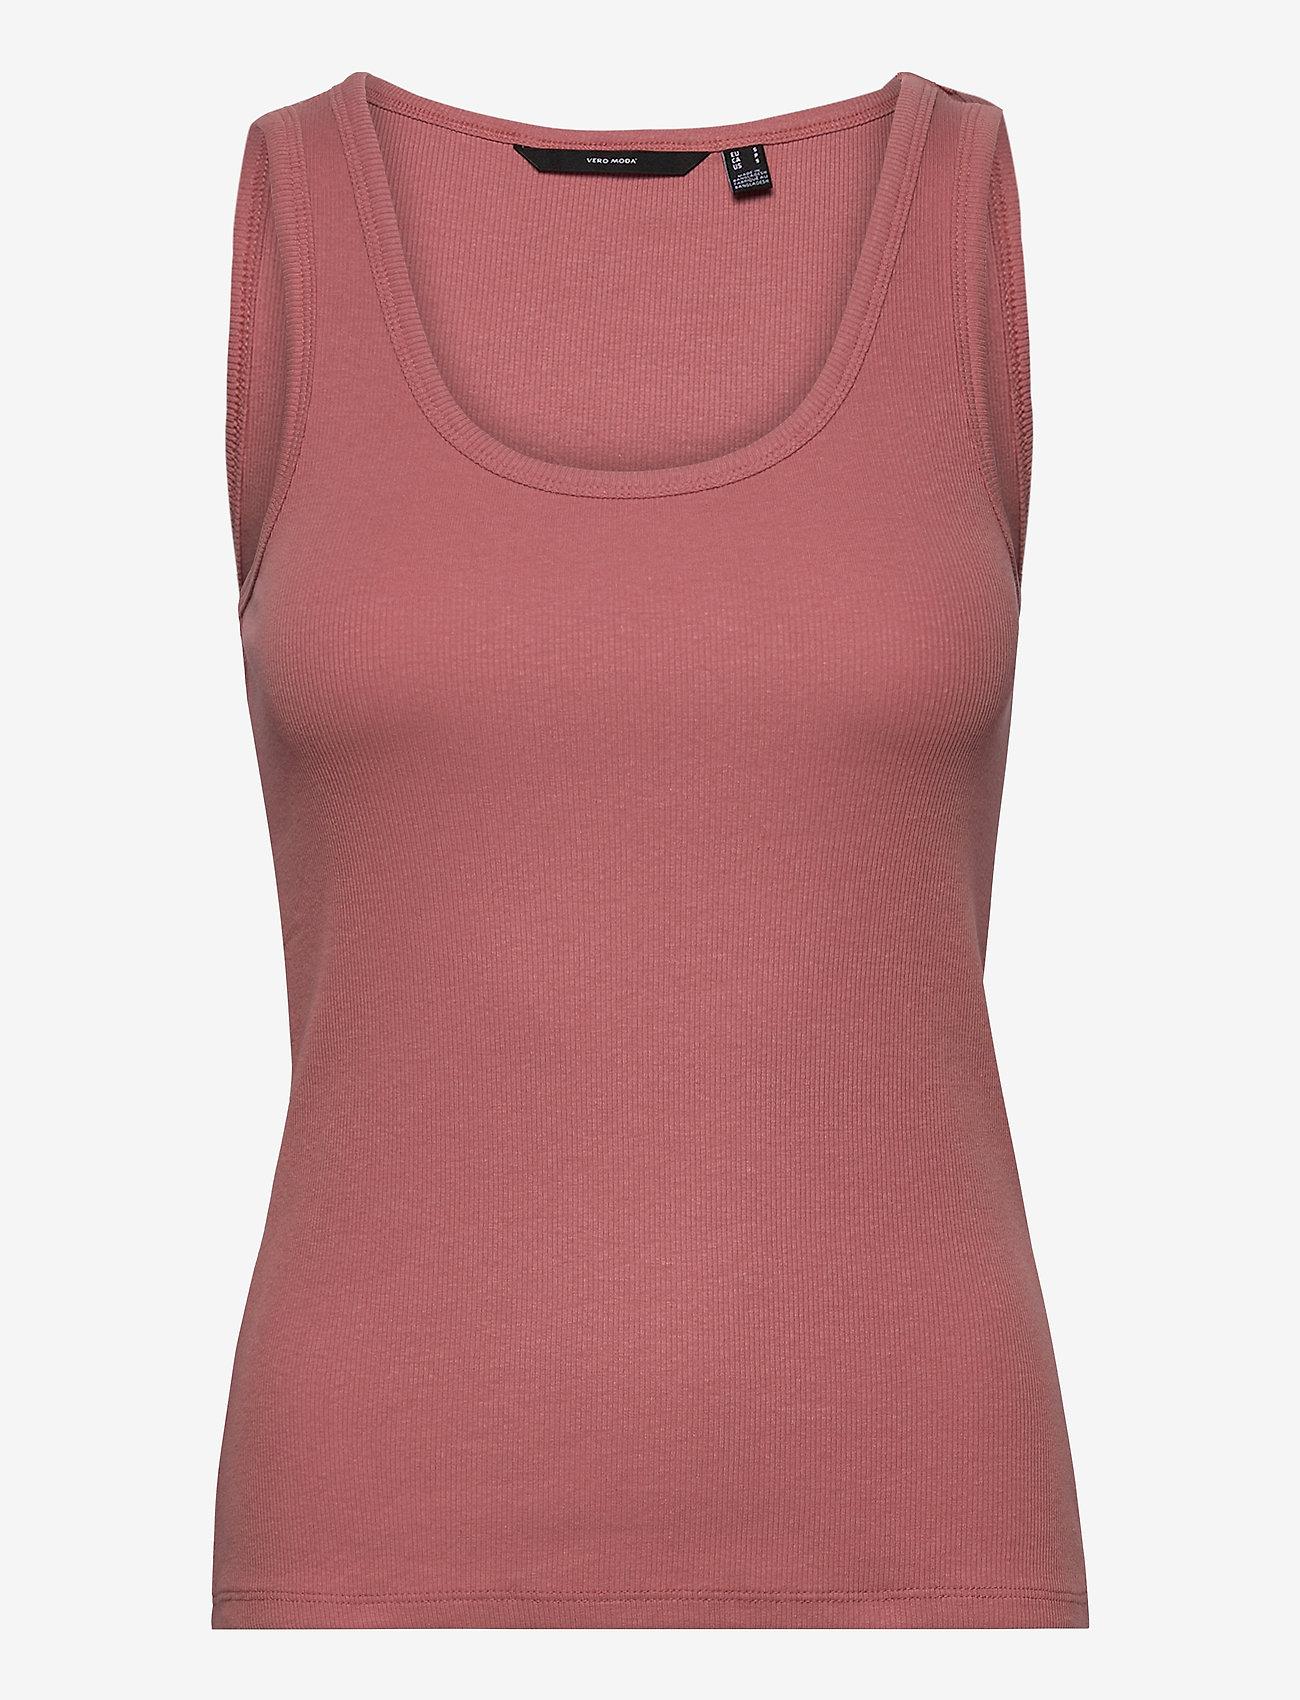 Vero Moda - VMJESSICA SL RIB TANK TOP GA COLOR - t-shirts - old rose - 0